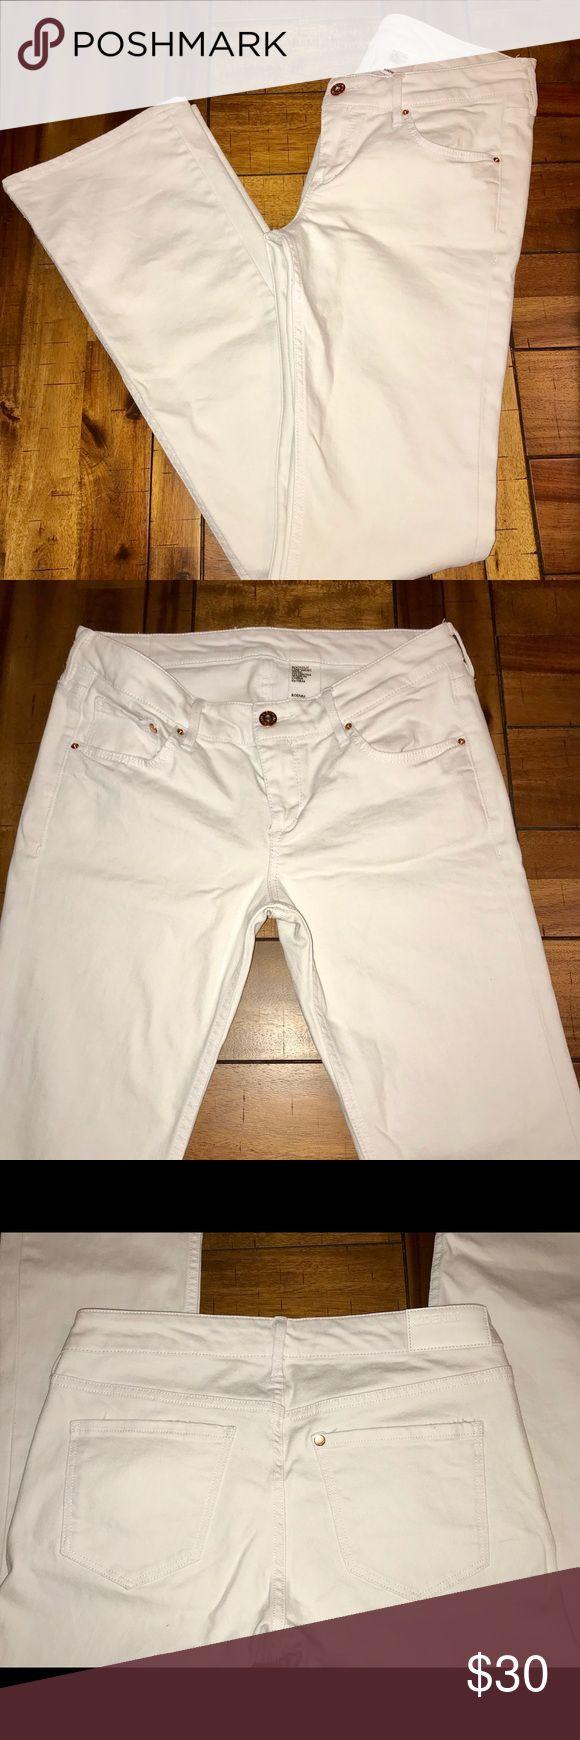 "H&M bootcut Jean sz 29 White bootcut Jean. Size 29x34. Bootcut opening appx 8.5"" across. Worn twice, like new. Pants"